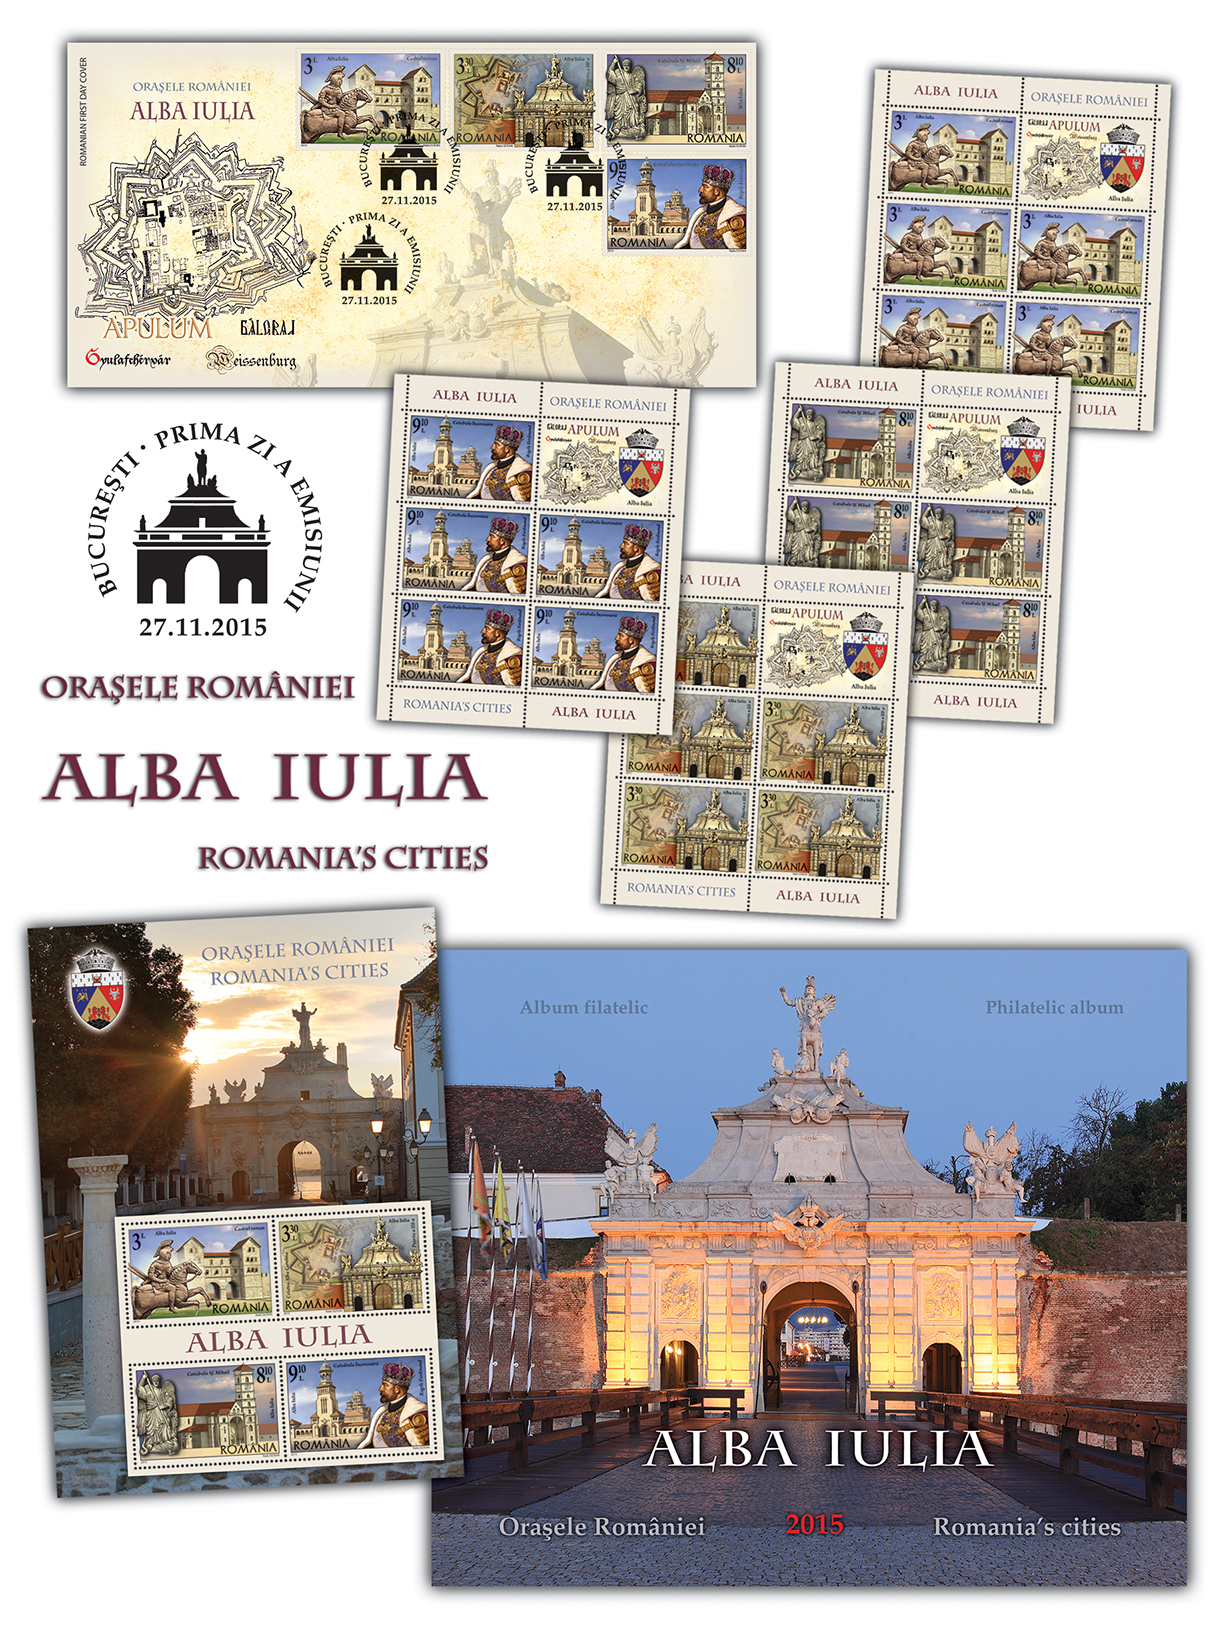 Orasele Romaniei, Alba Iulia_Romania's cities, Alba Iulia